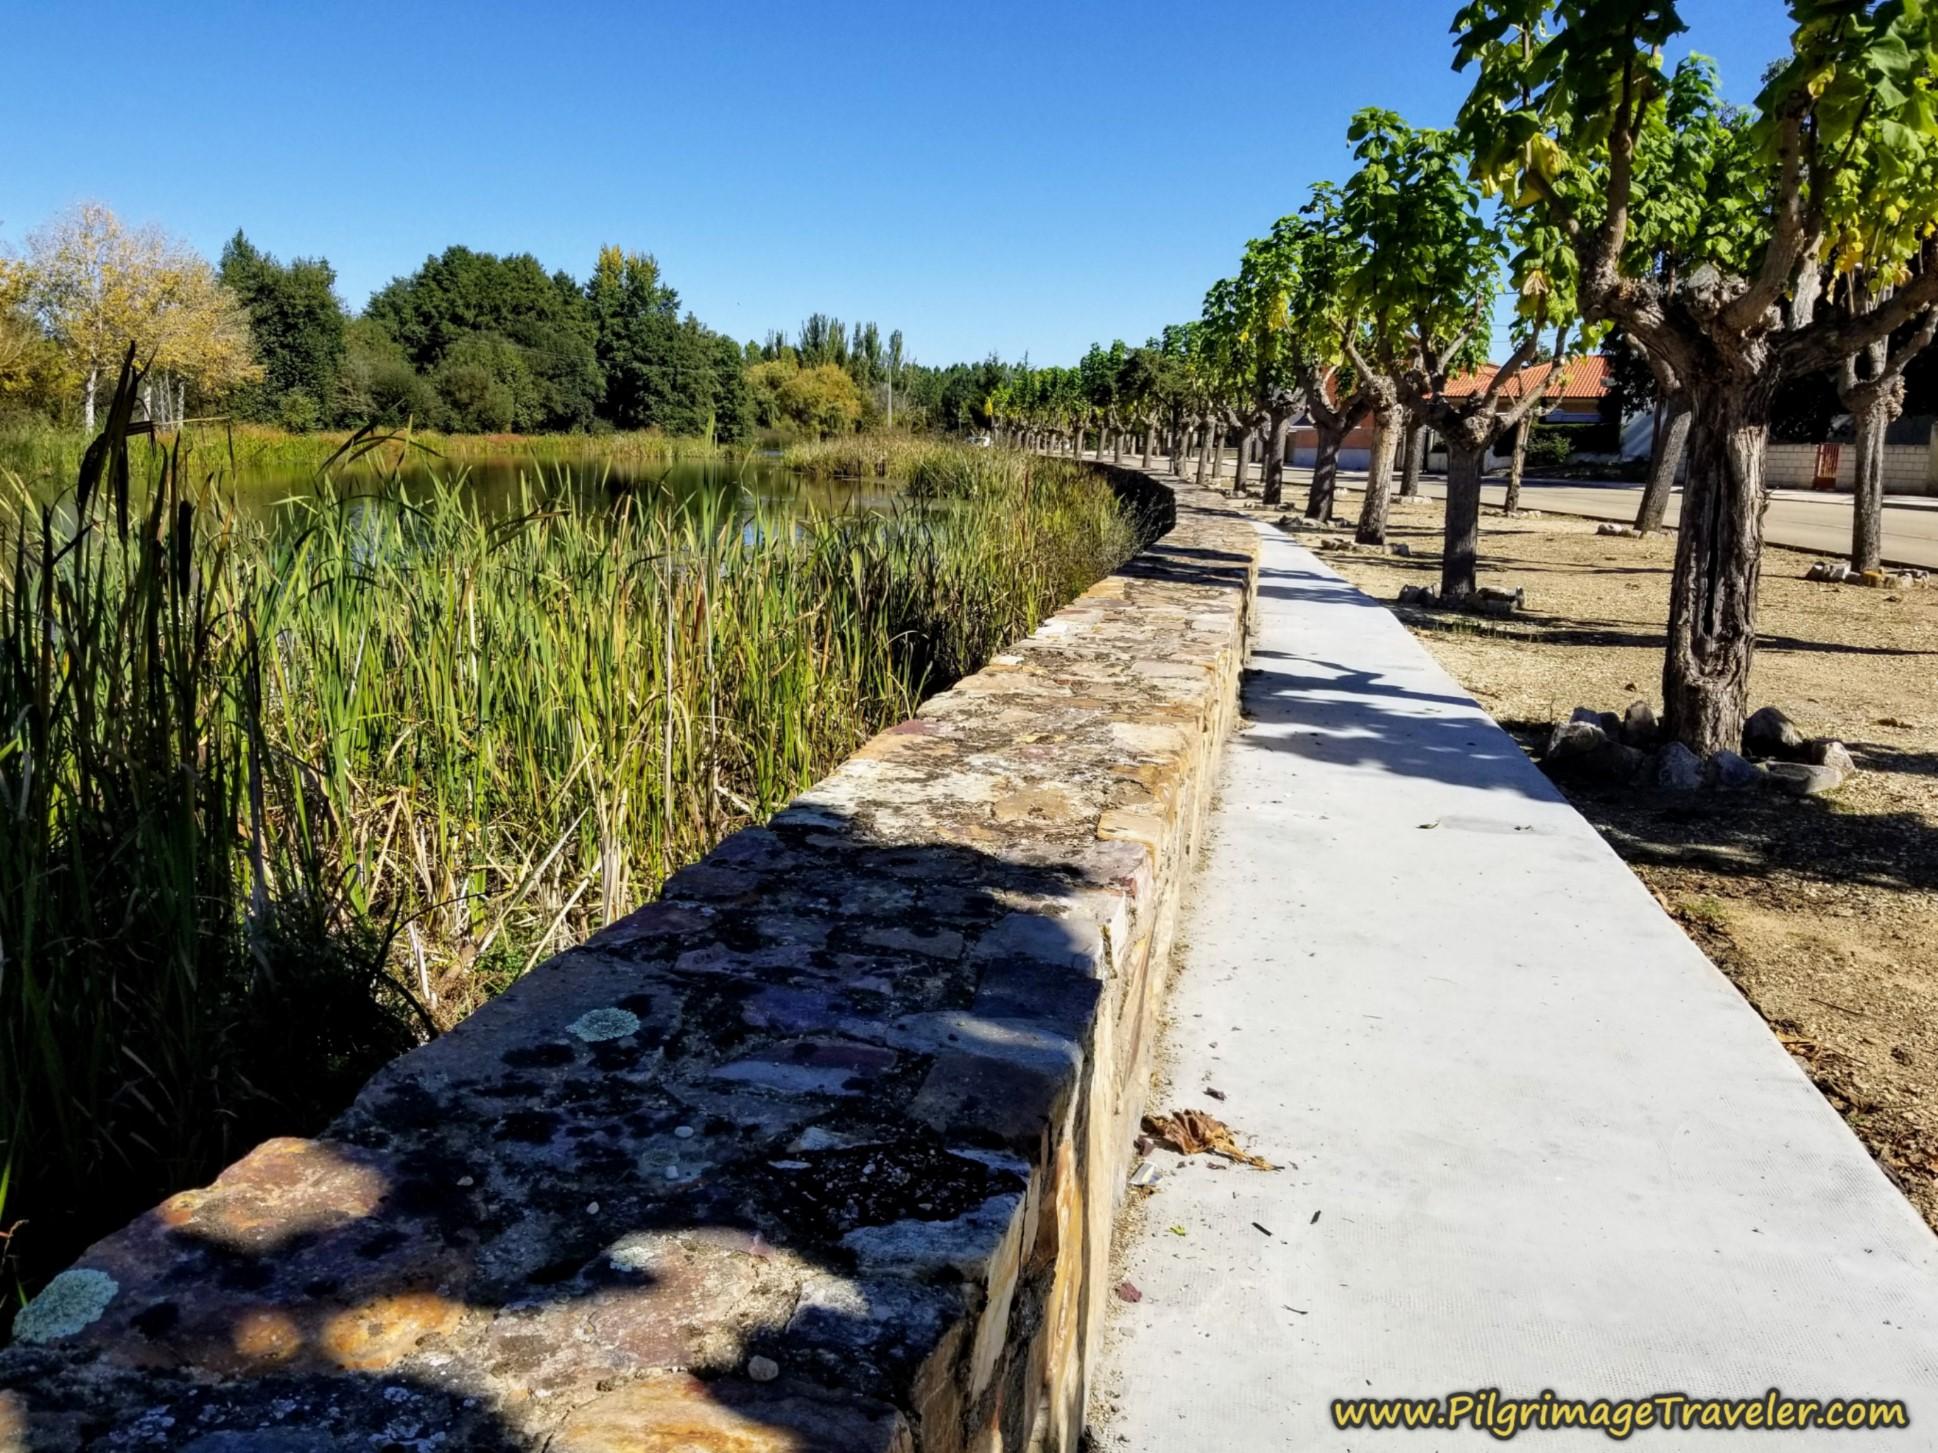 Río Tera Riverwalk in Santa Croya de Tera on the Camino Sanabrés from Tábara to Santa Marta de Tera